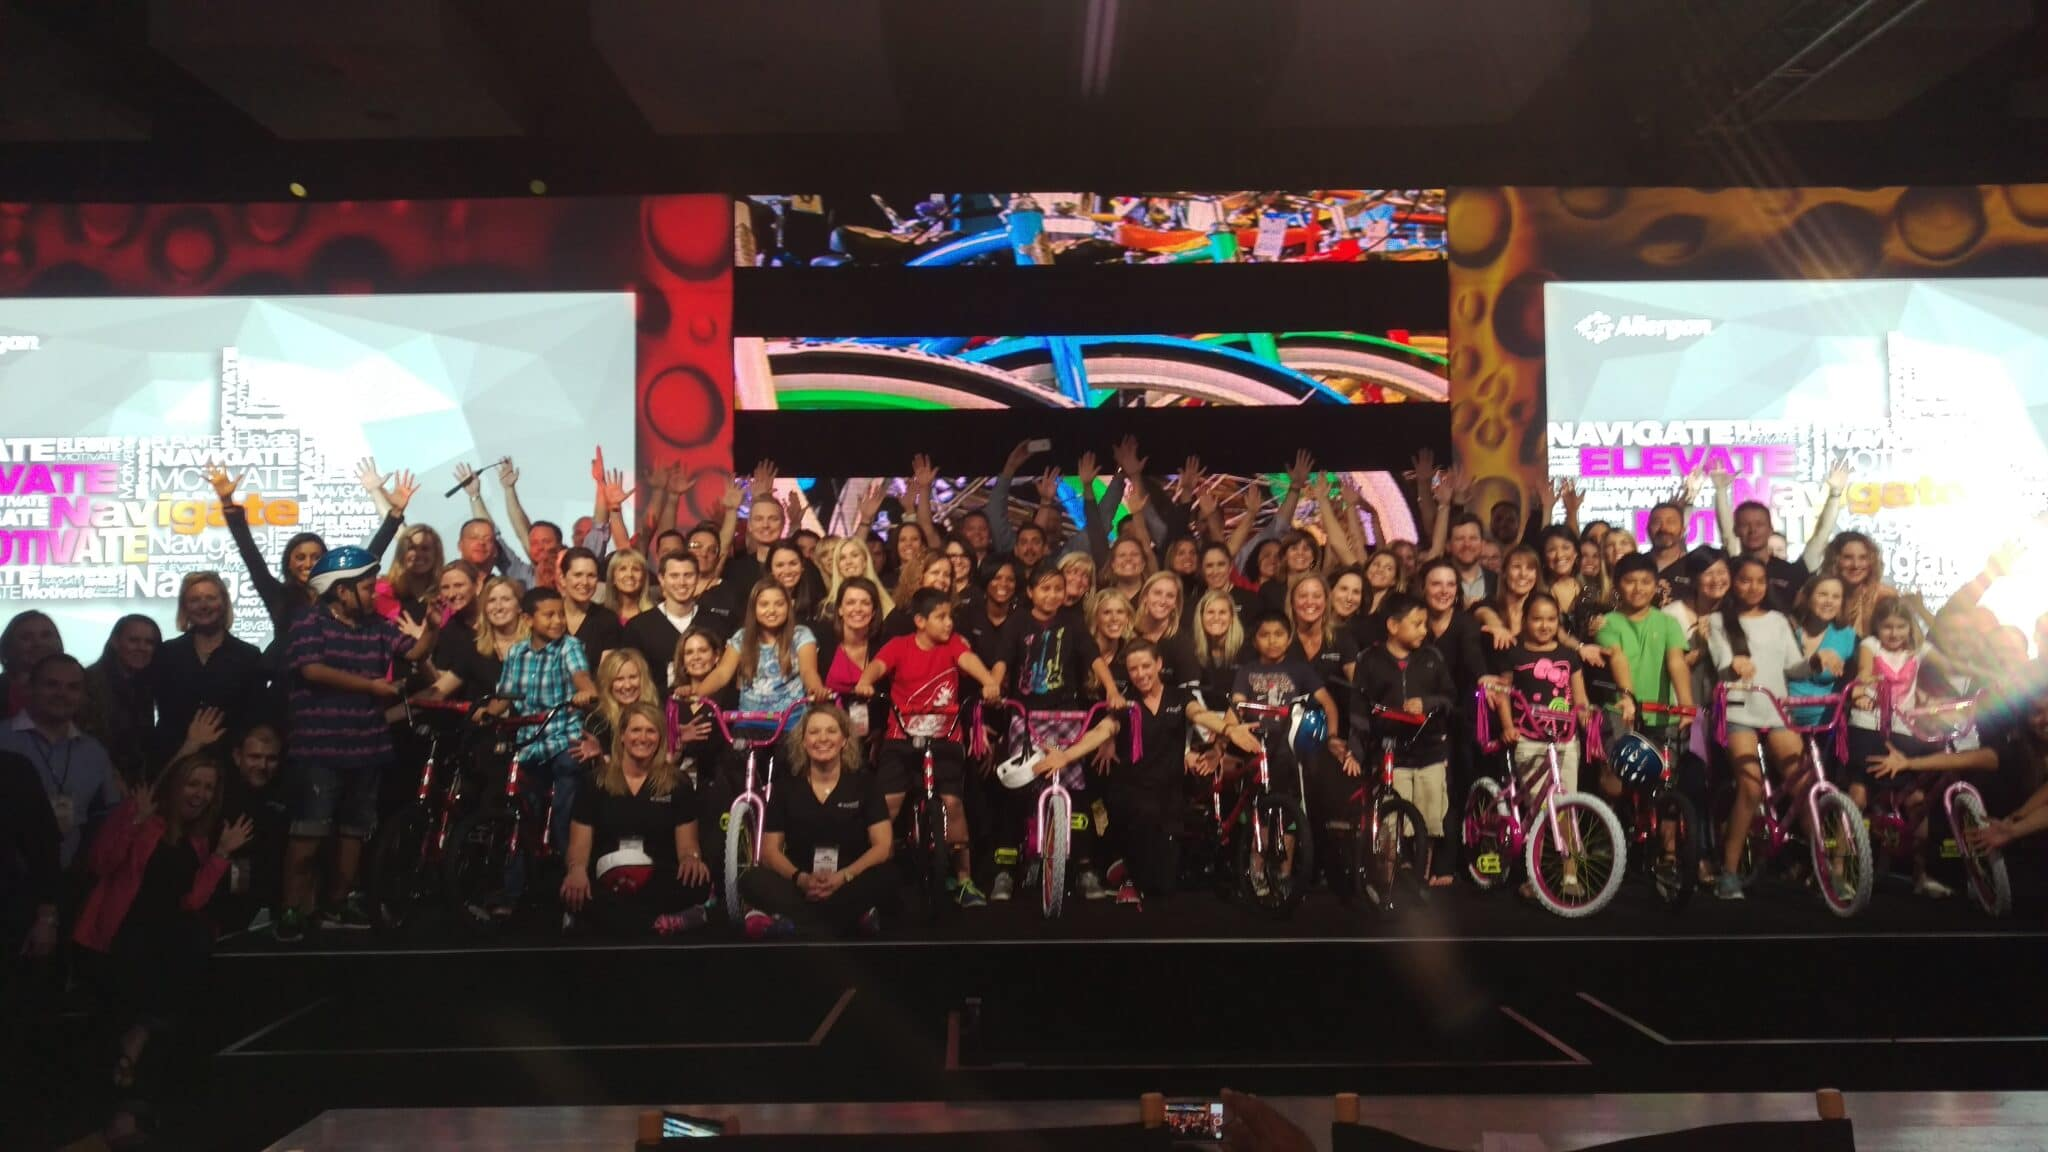 Allegan Build-A-Bike Team Event in San Diego, California